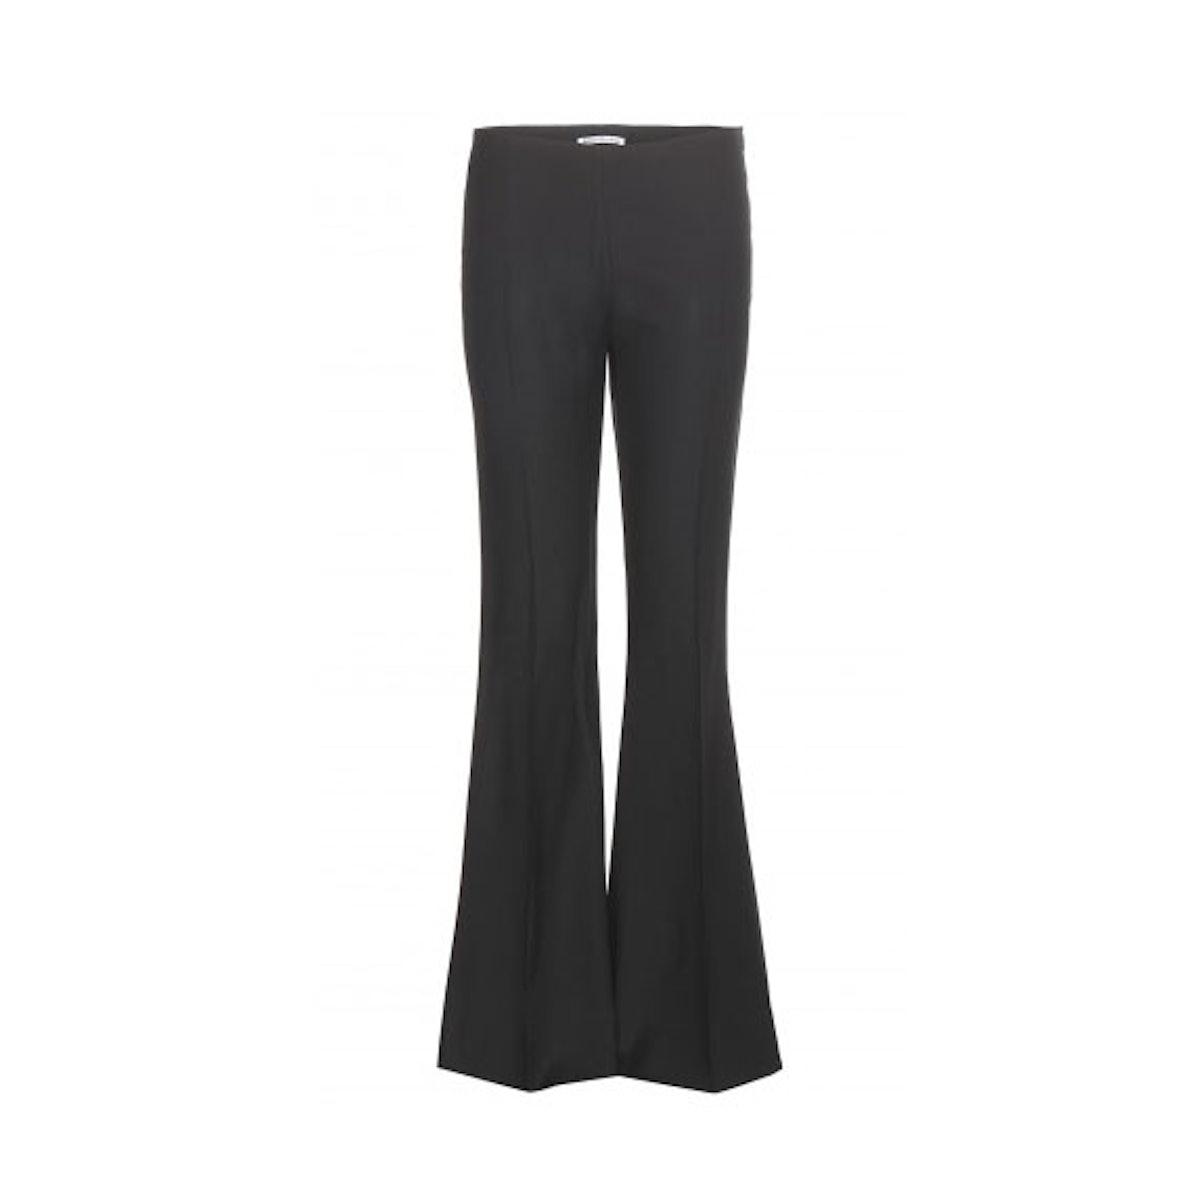 Acne Studios Mello flared trousers